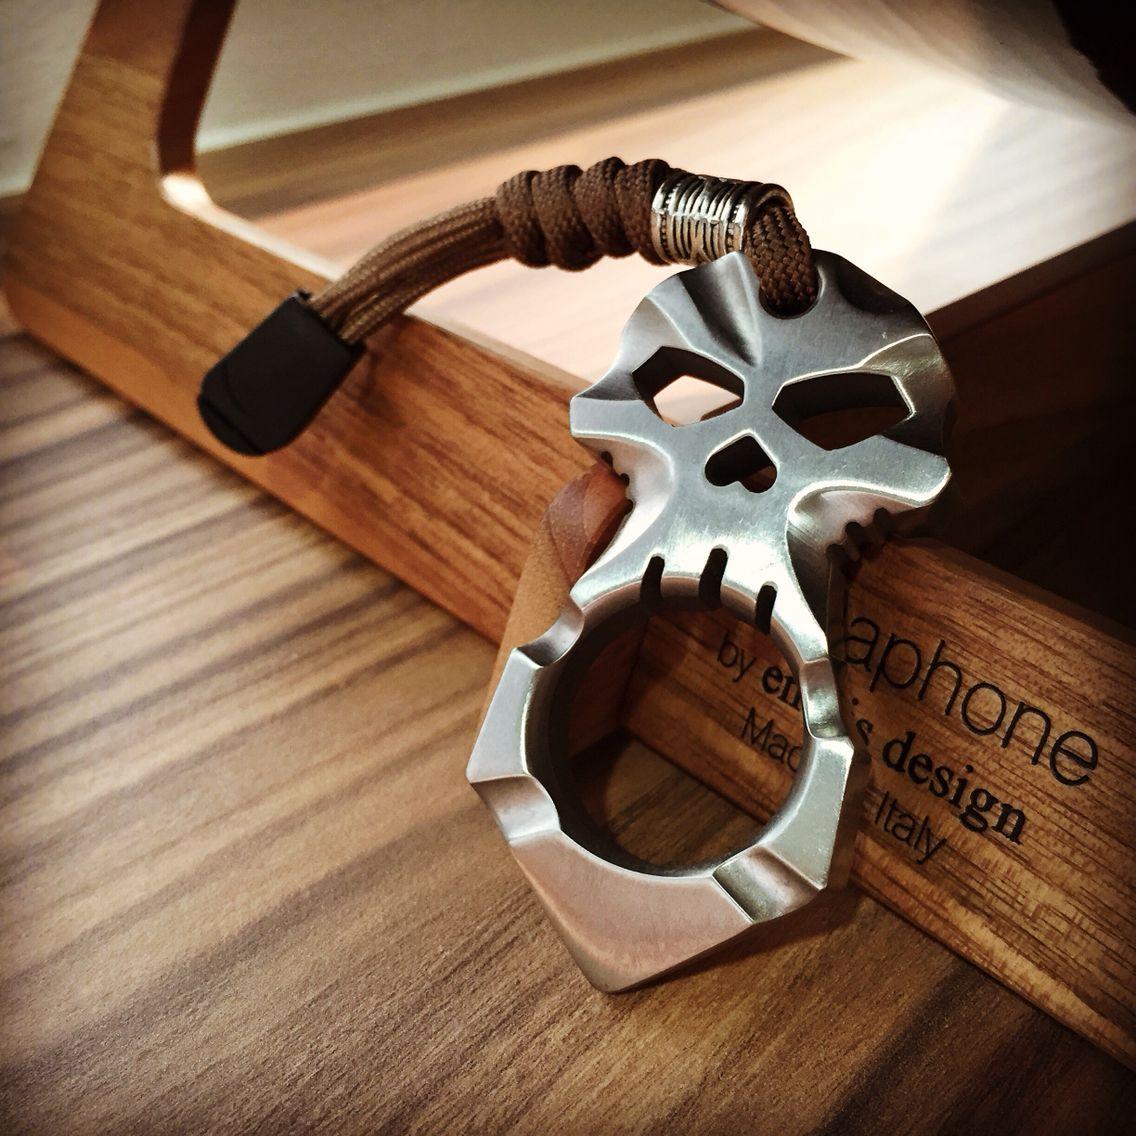 Got it today!! G-JMD Ti Titanium EDC Ferocious Skull Skeleton (Self-Defense Tool)  #gjmd #titanium #edc #edcgear #edcmini #tititanium #selfdefense #edctool #edctoday #skullgear #skeleton #tigear #everydaycarry #everyday_carry #tactical #knuck #knucksdaily #knucks